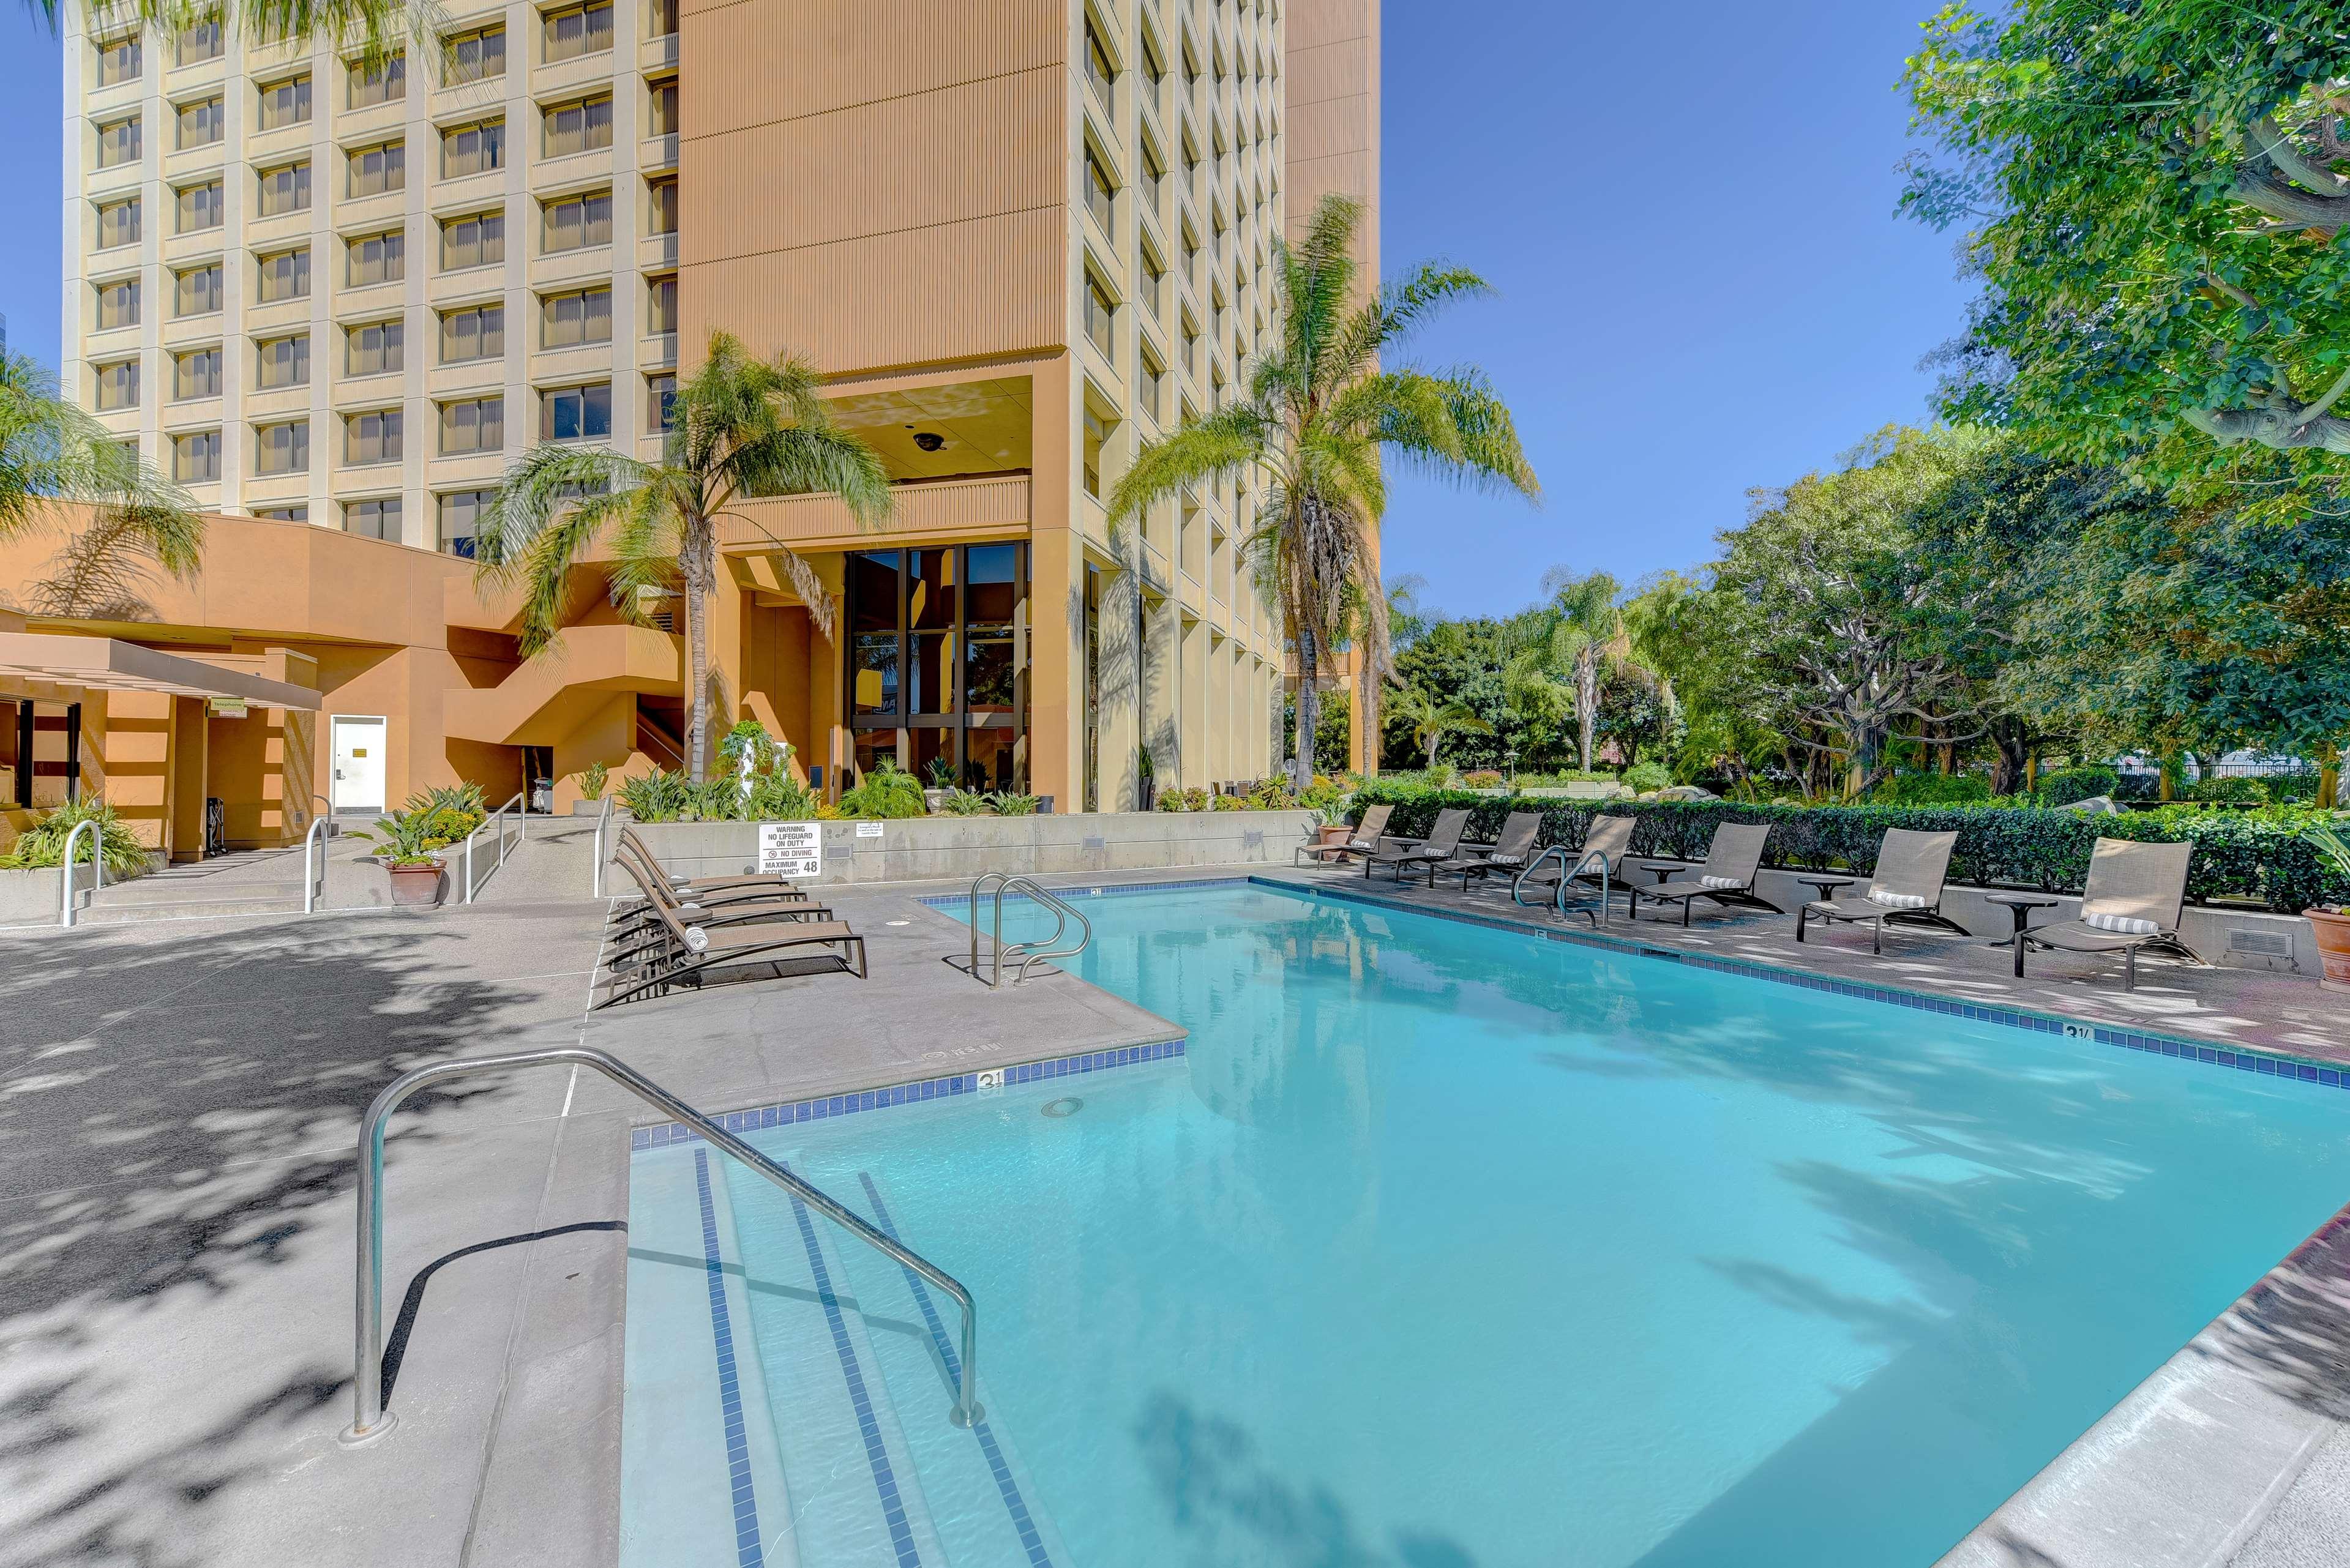 DoubleTree by Hilton Hotel Anaheim - Orange County image 20